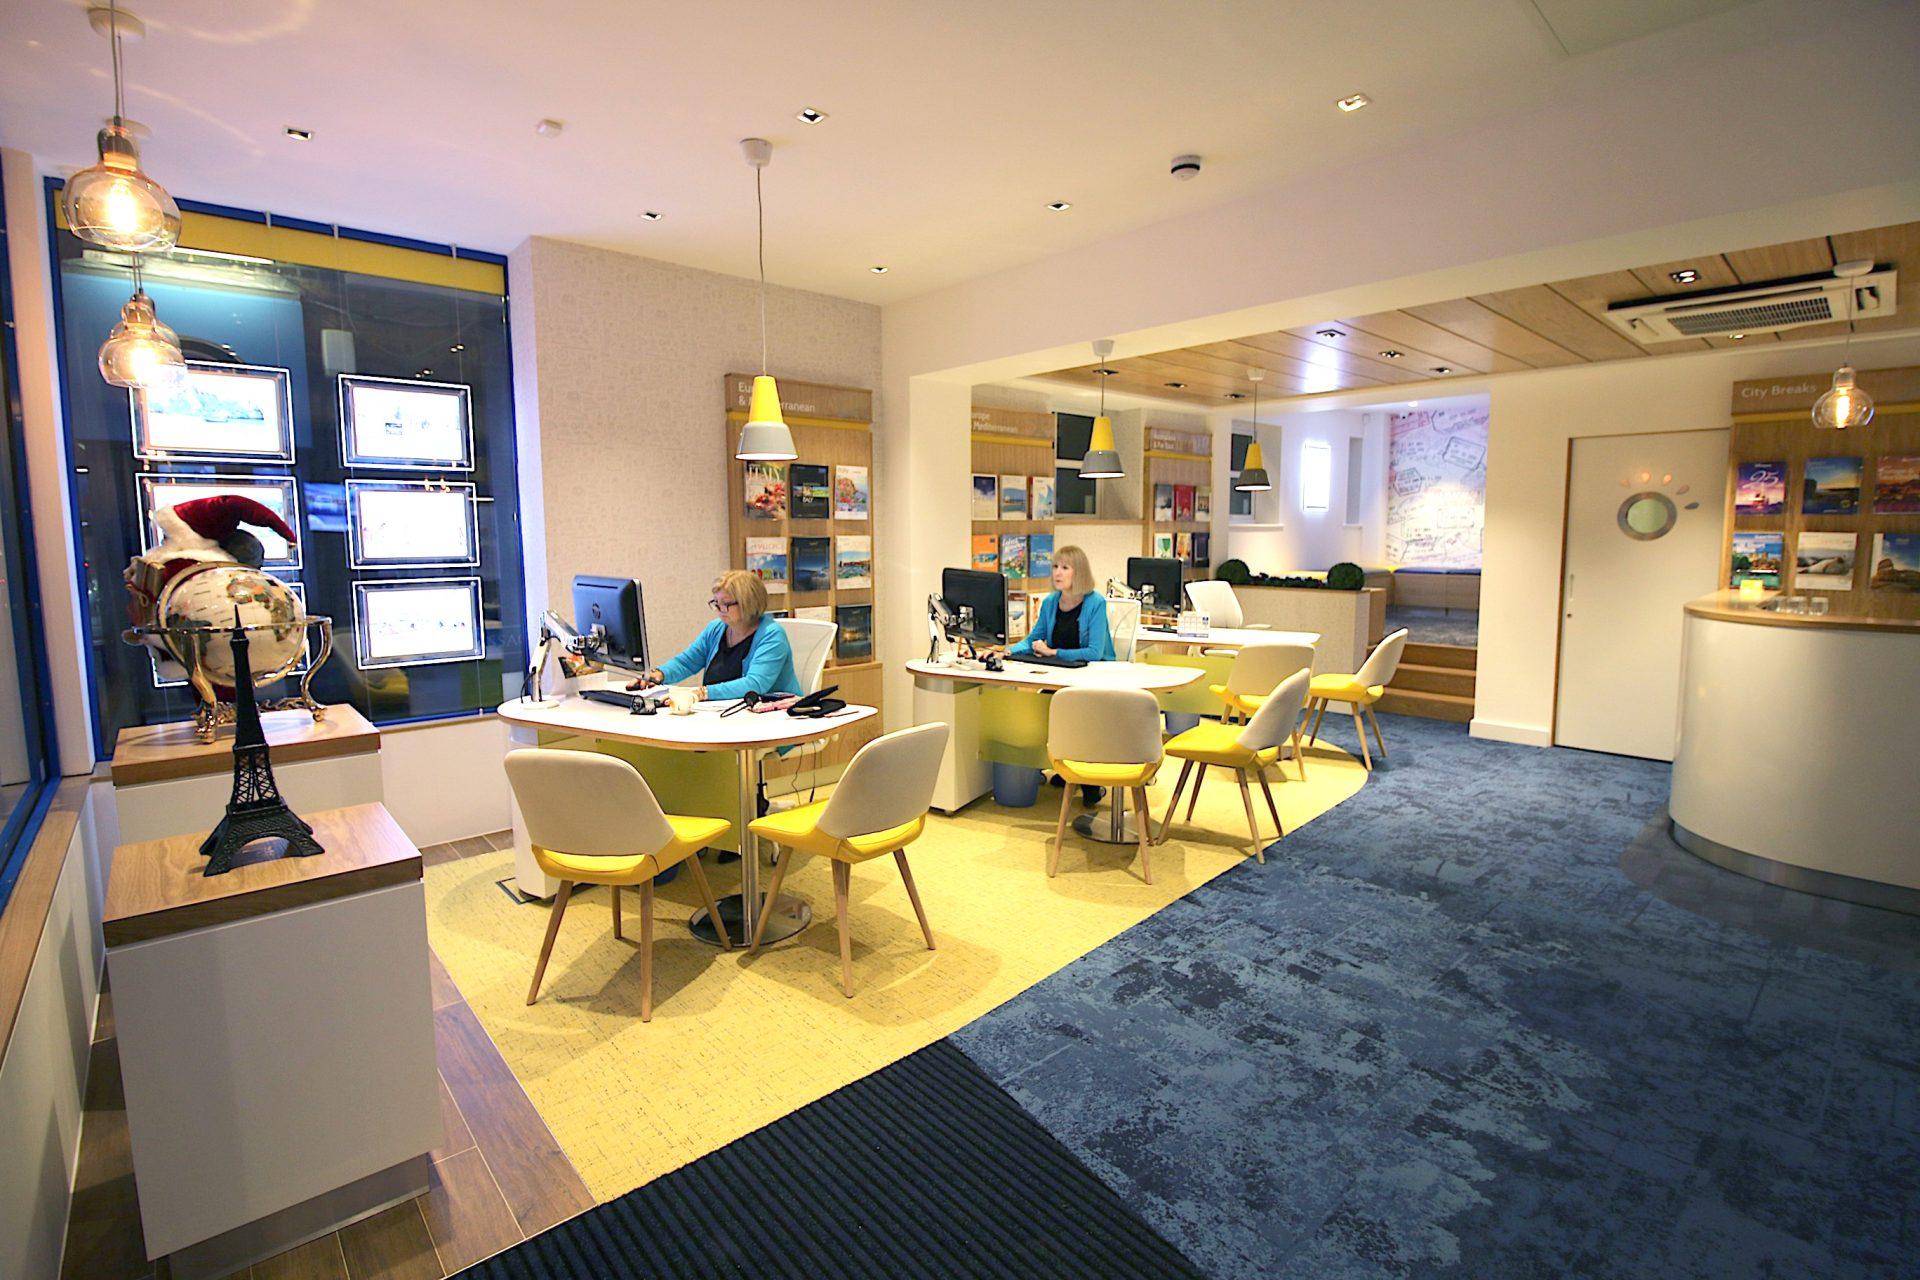 Go Travel_Chislhrust_Interior Design By Nugget Design 07